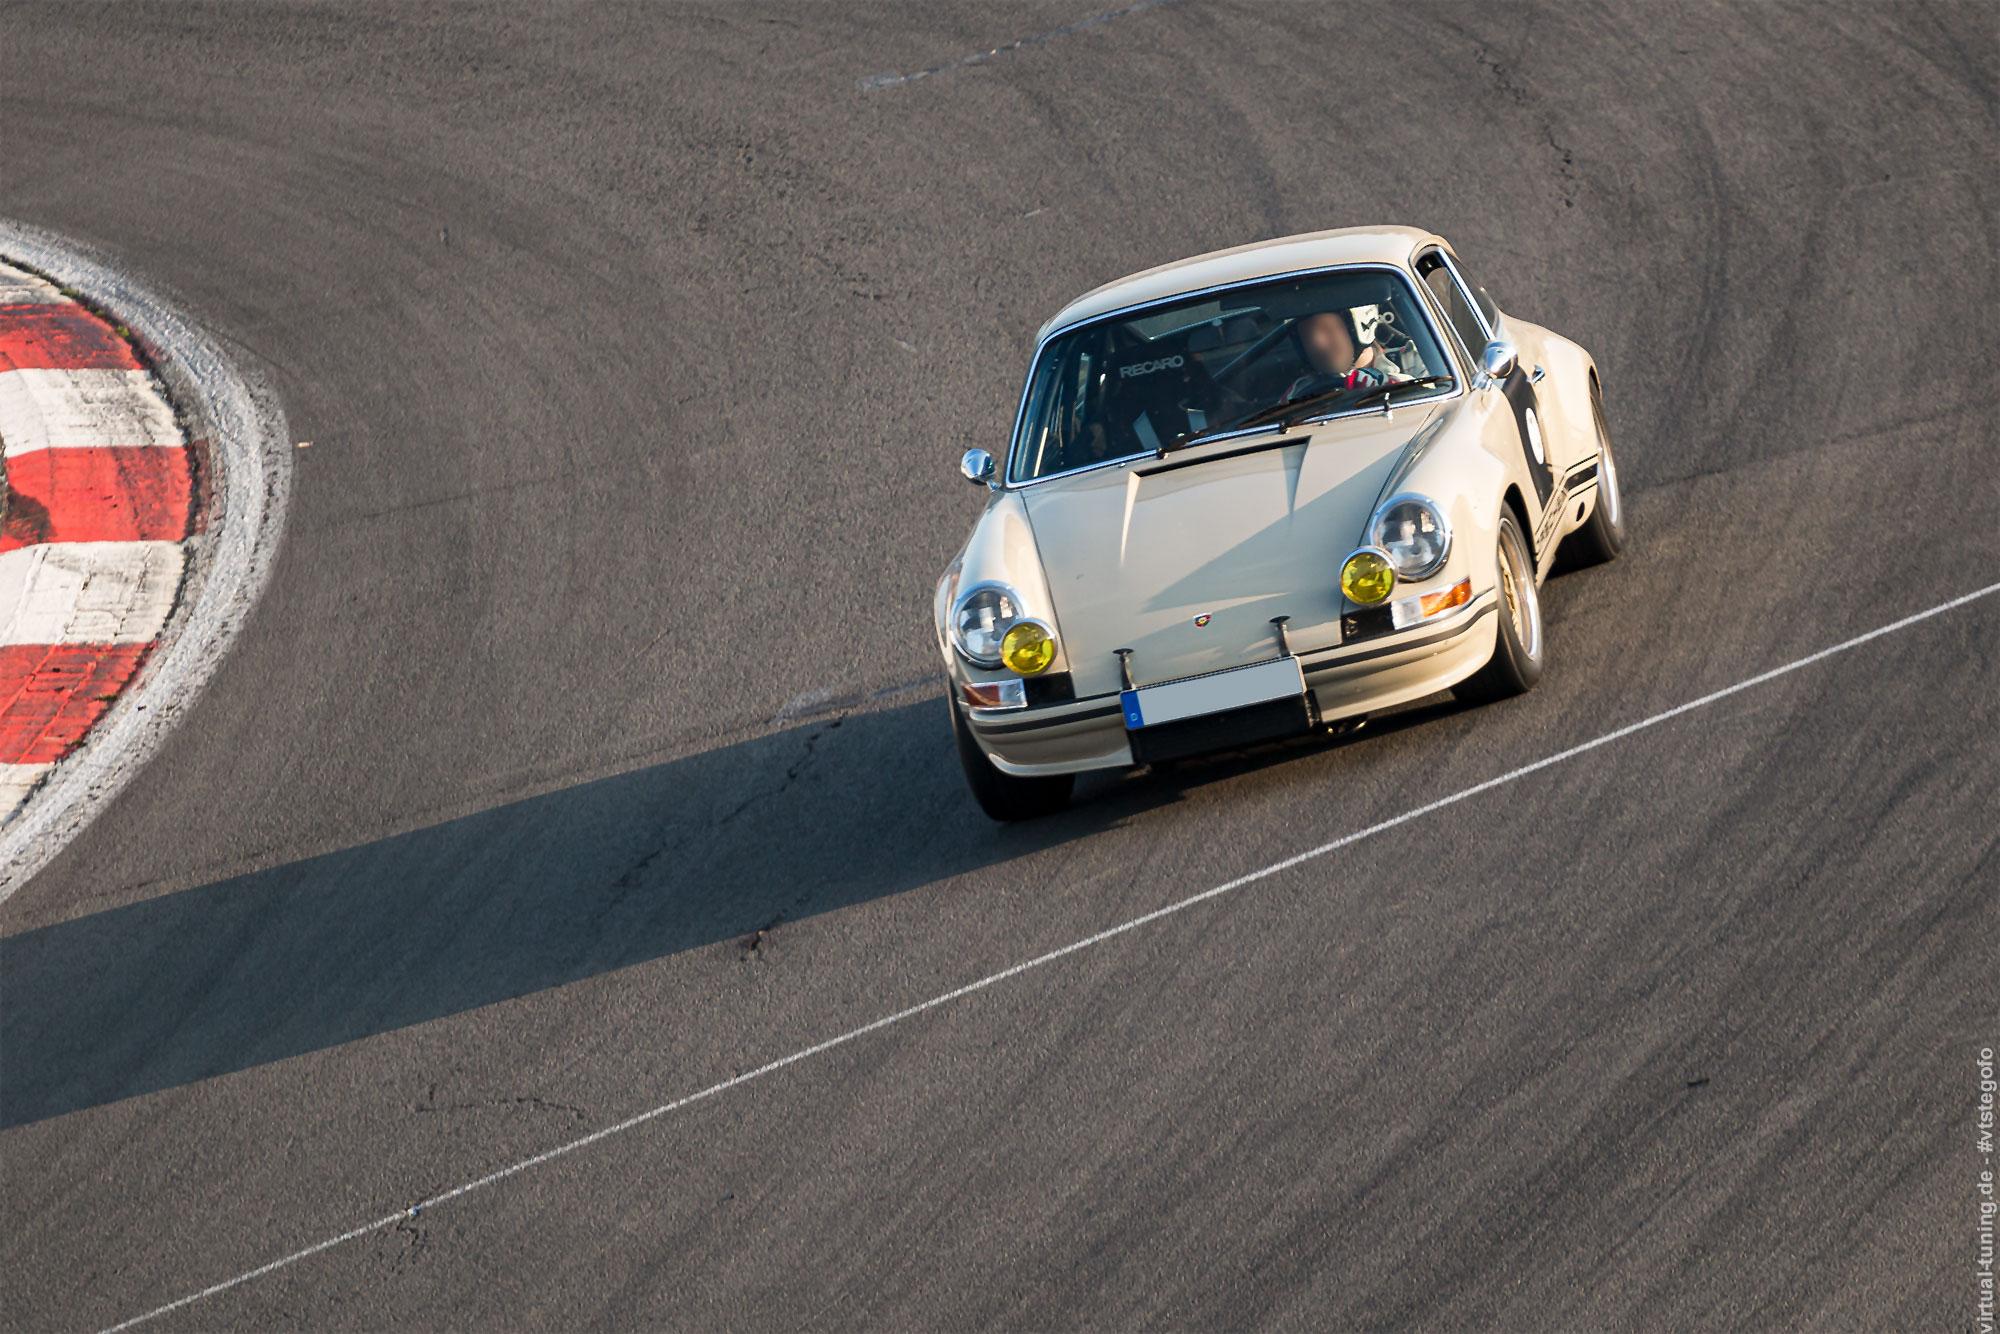 Porsche 911 - Nürburgring Grand-Prix Strecke (31.03.2019)